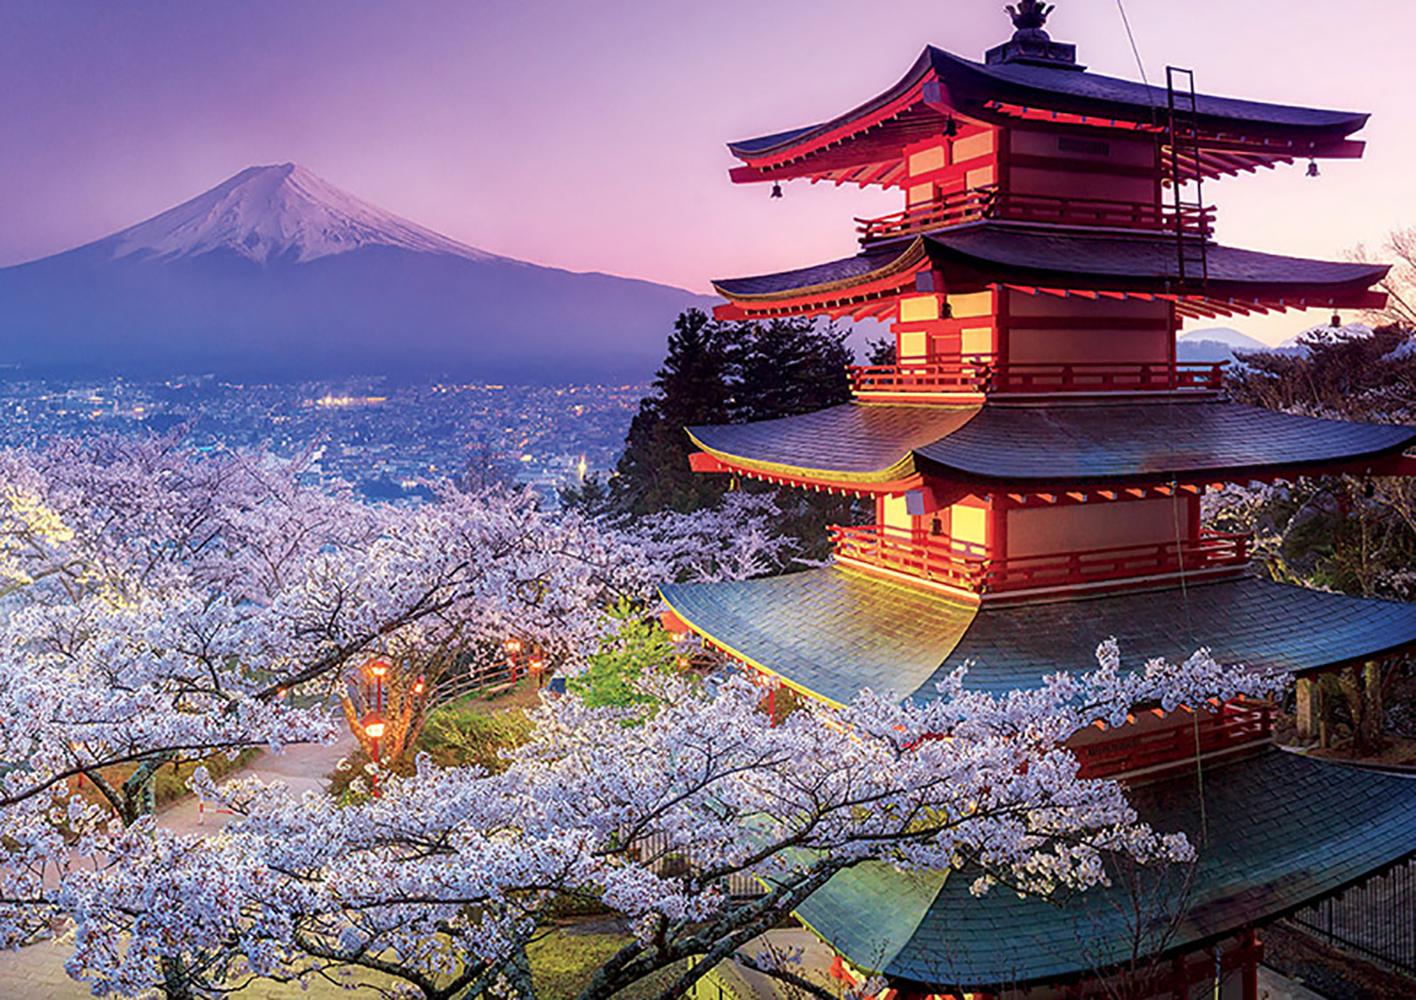 Puzzle 2000 pieces - Mount Fuji, Japan